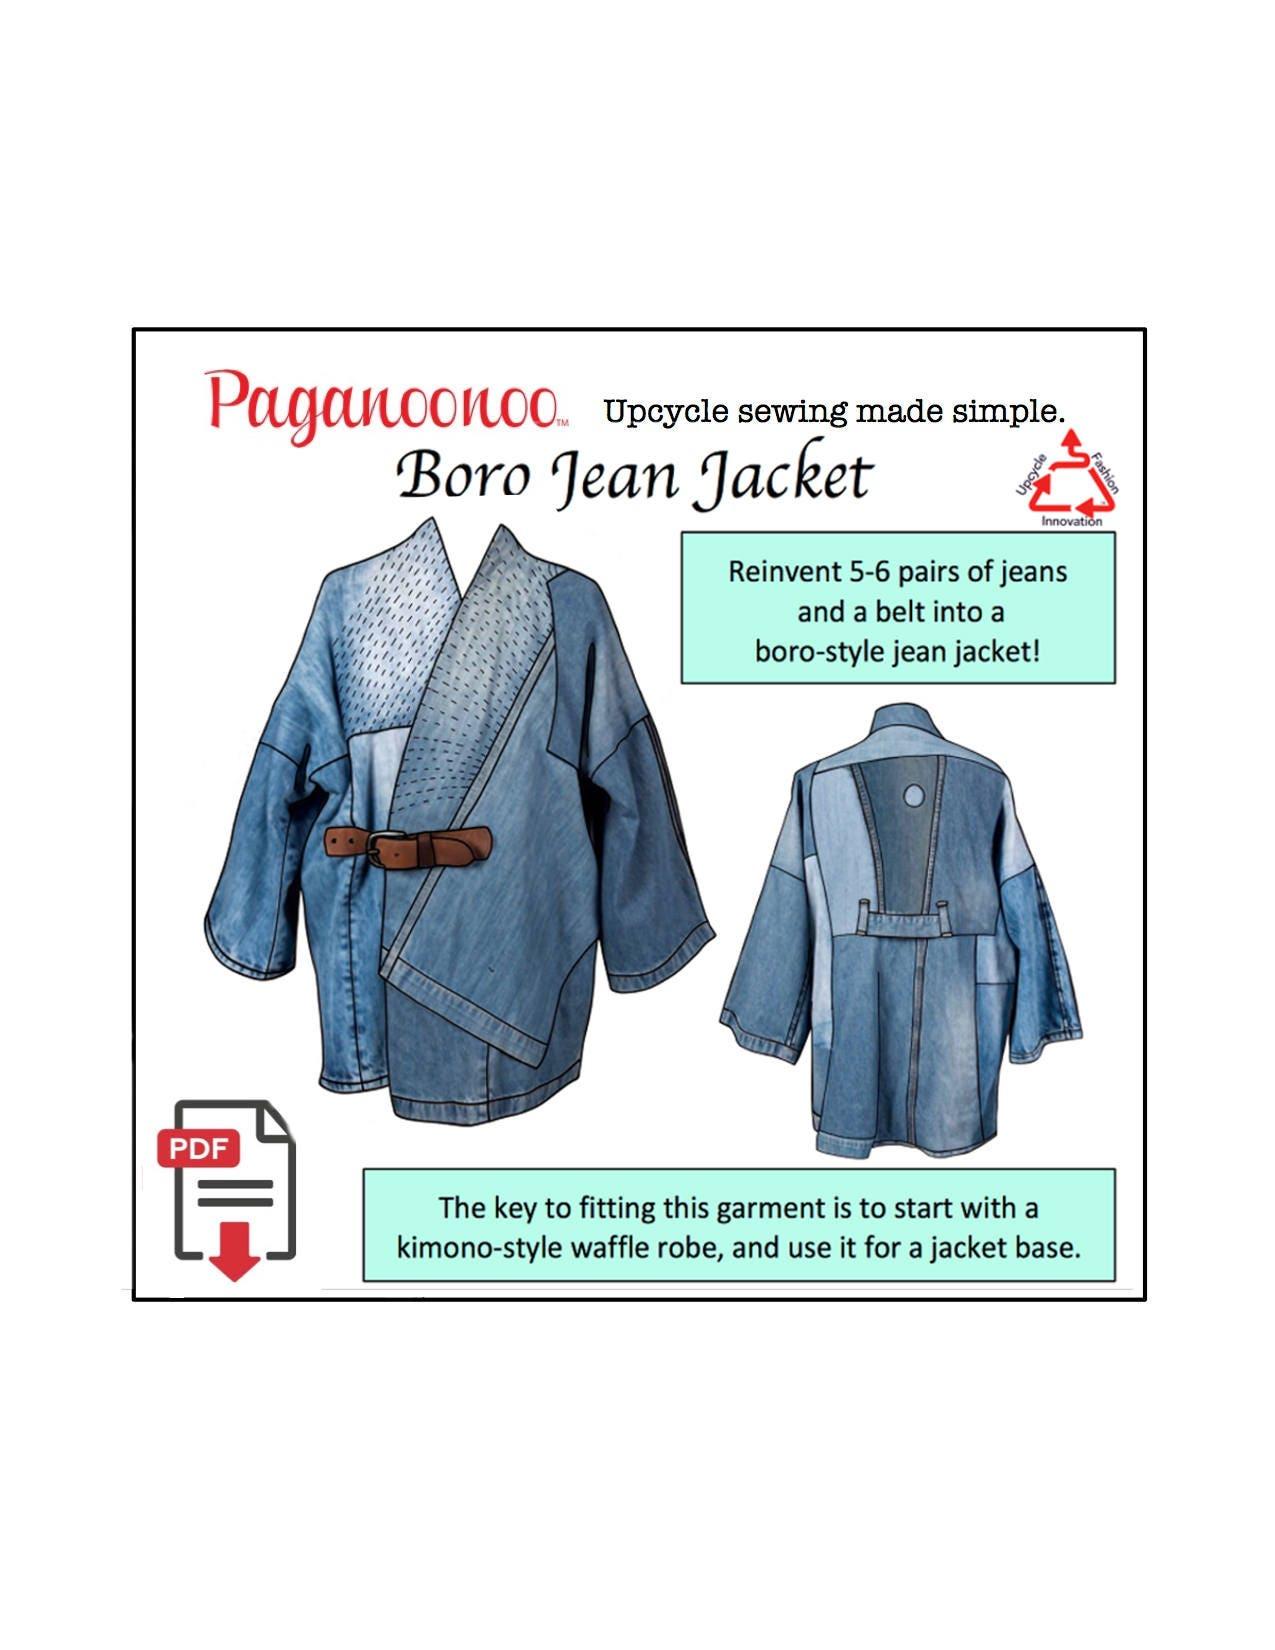 PDF Paganoonoo Boro Jean Jacket Sewing Pattern. Upcycle denim